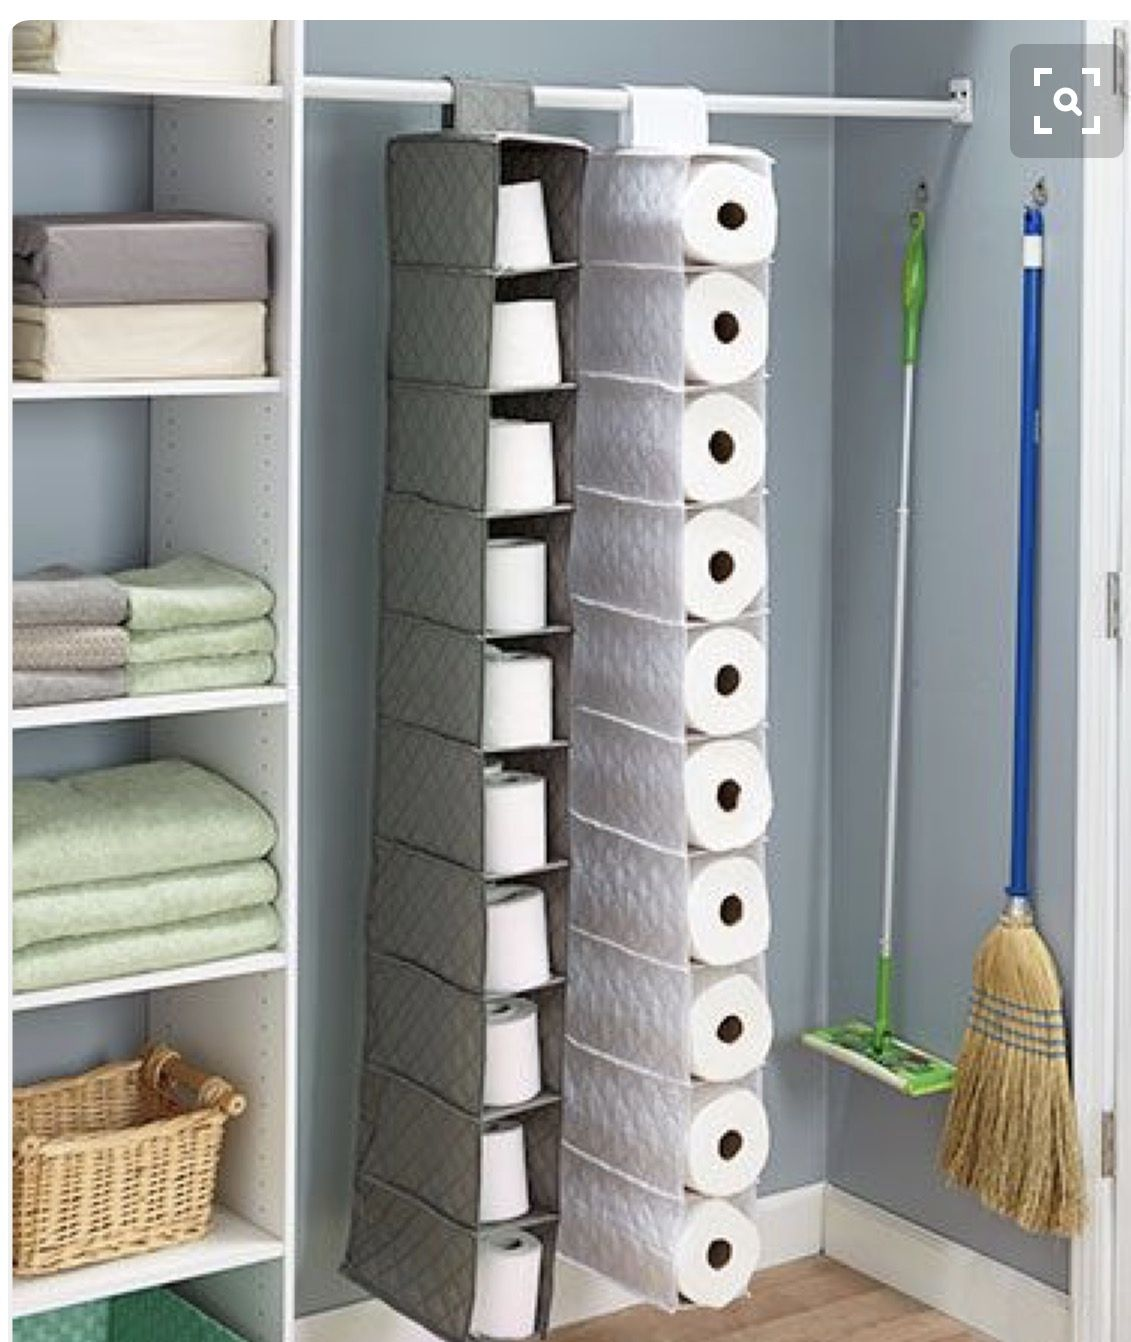 Bulk paper towel or TP storage idea  Household Tips